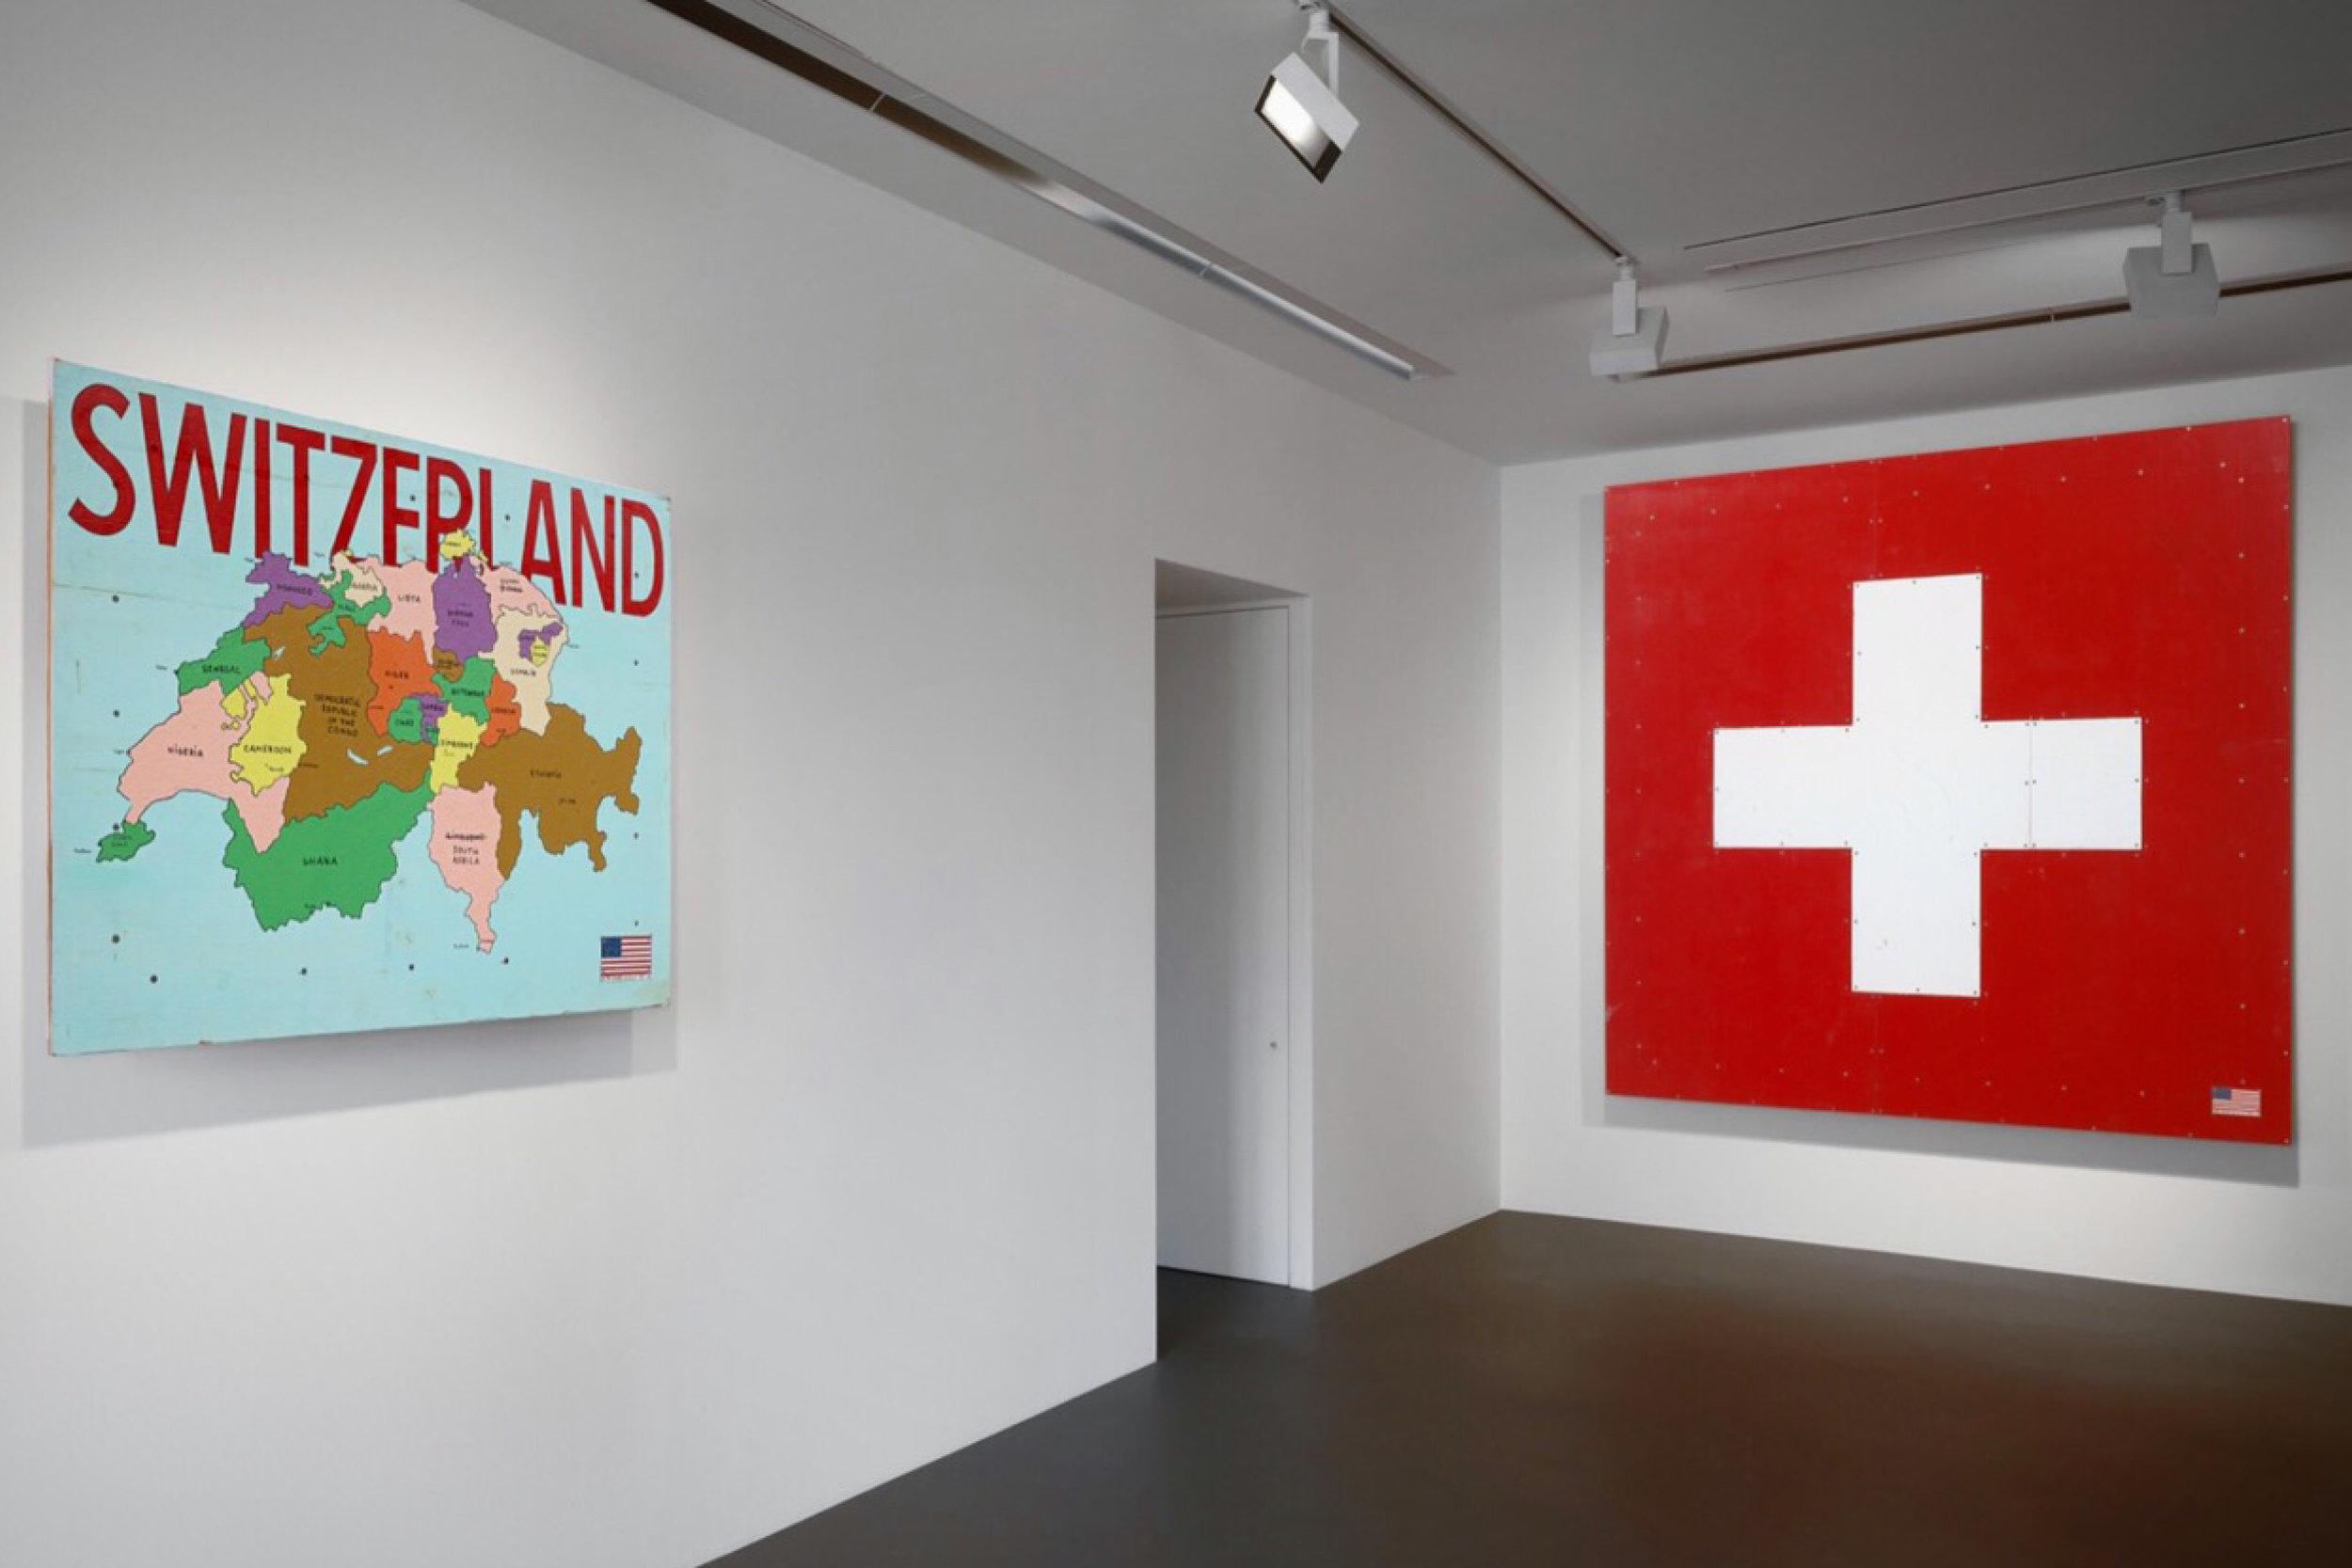 Installation View: Tom Sachs,  The Pack , 2018 - 2019. Vito Schnabel Gallery, St. Moritz, Switzerland / Left -  Switzerland  (2018) ; Right -  Flag  (2018) © Tom Sachs